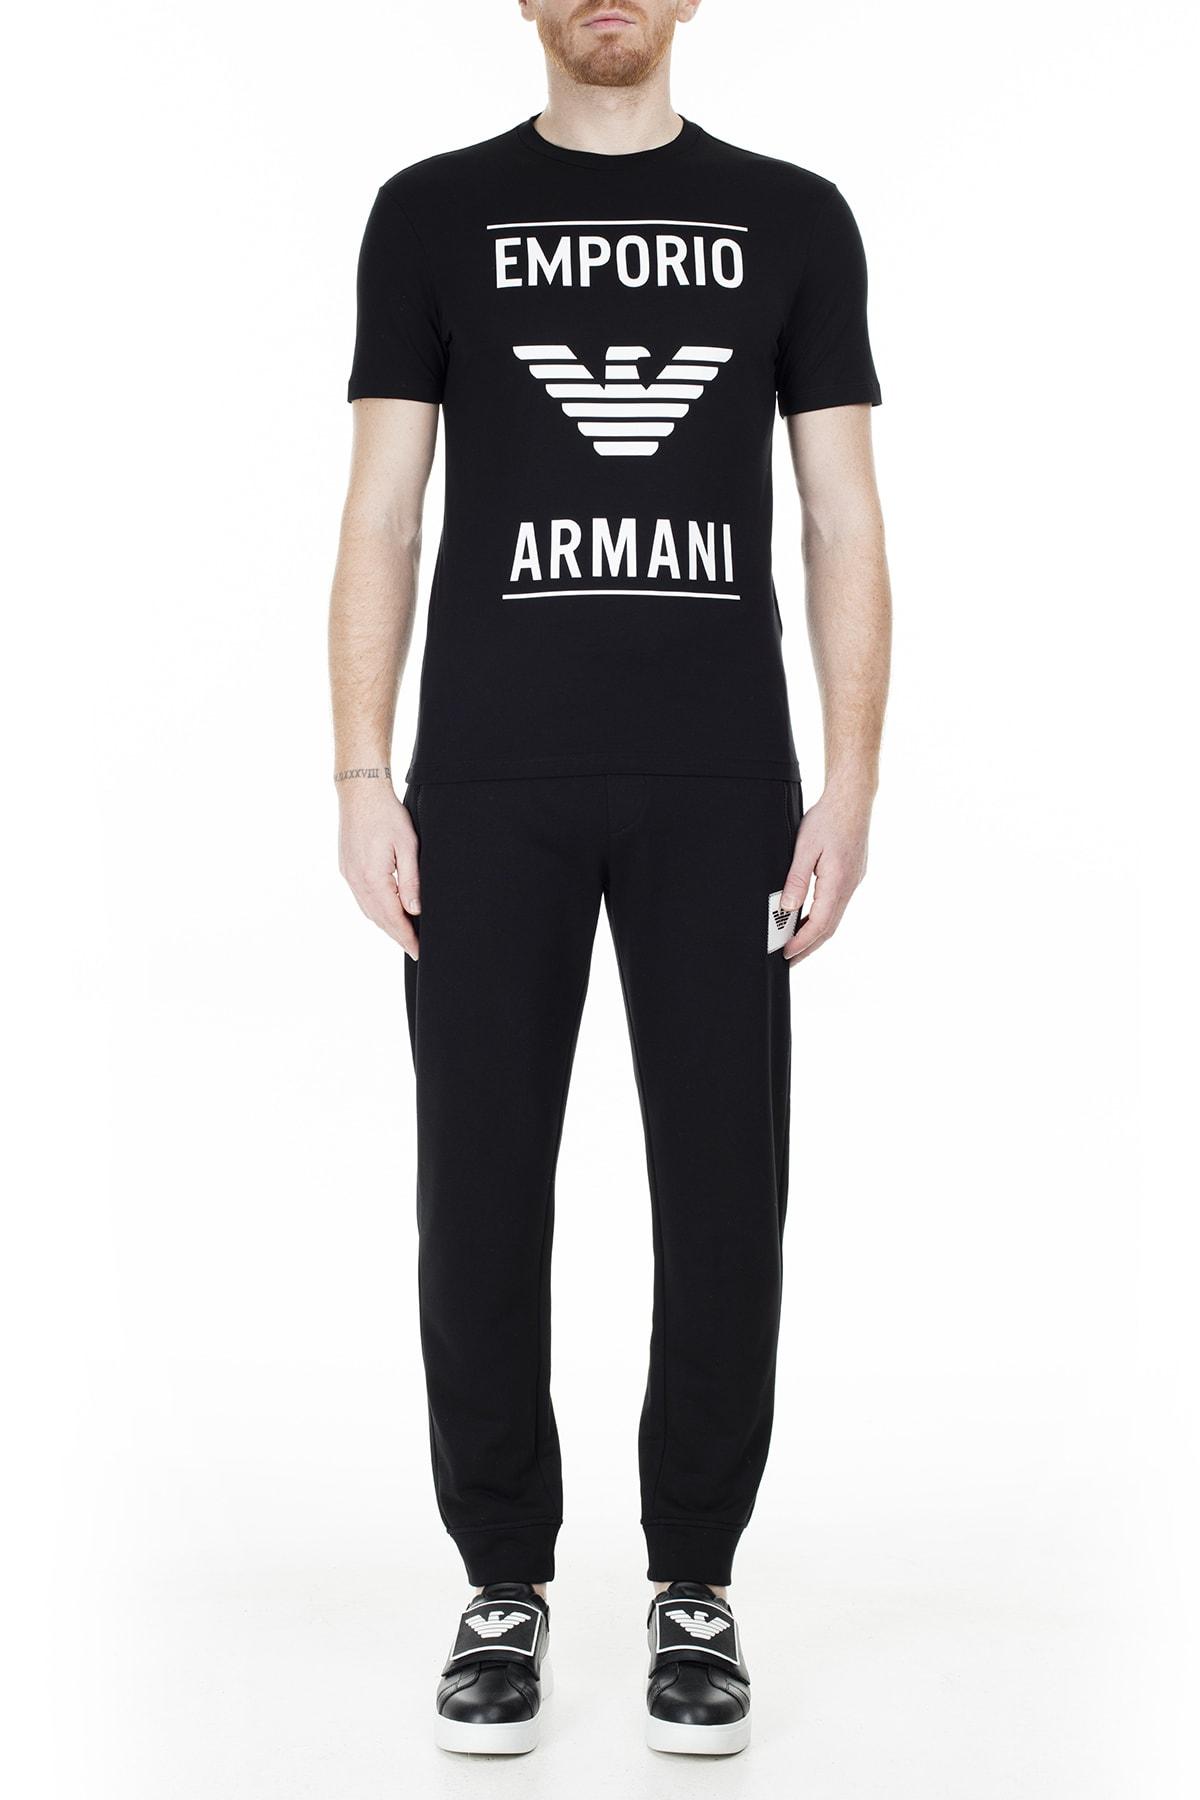 Emporio Armani T Shirt Erkek T Shirt S 6G1Te7 1Jnqz 0999 S 6G1TE7 1JNQZ 0999 4